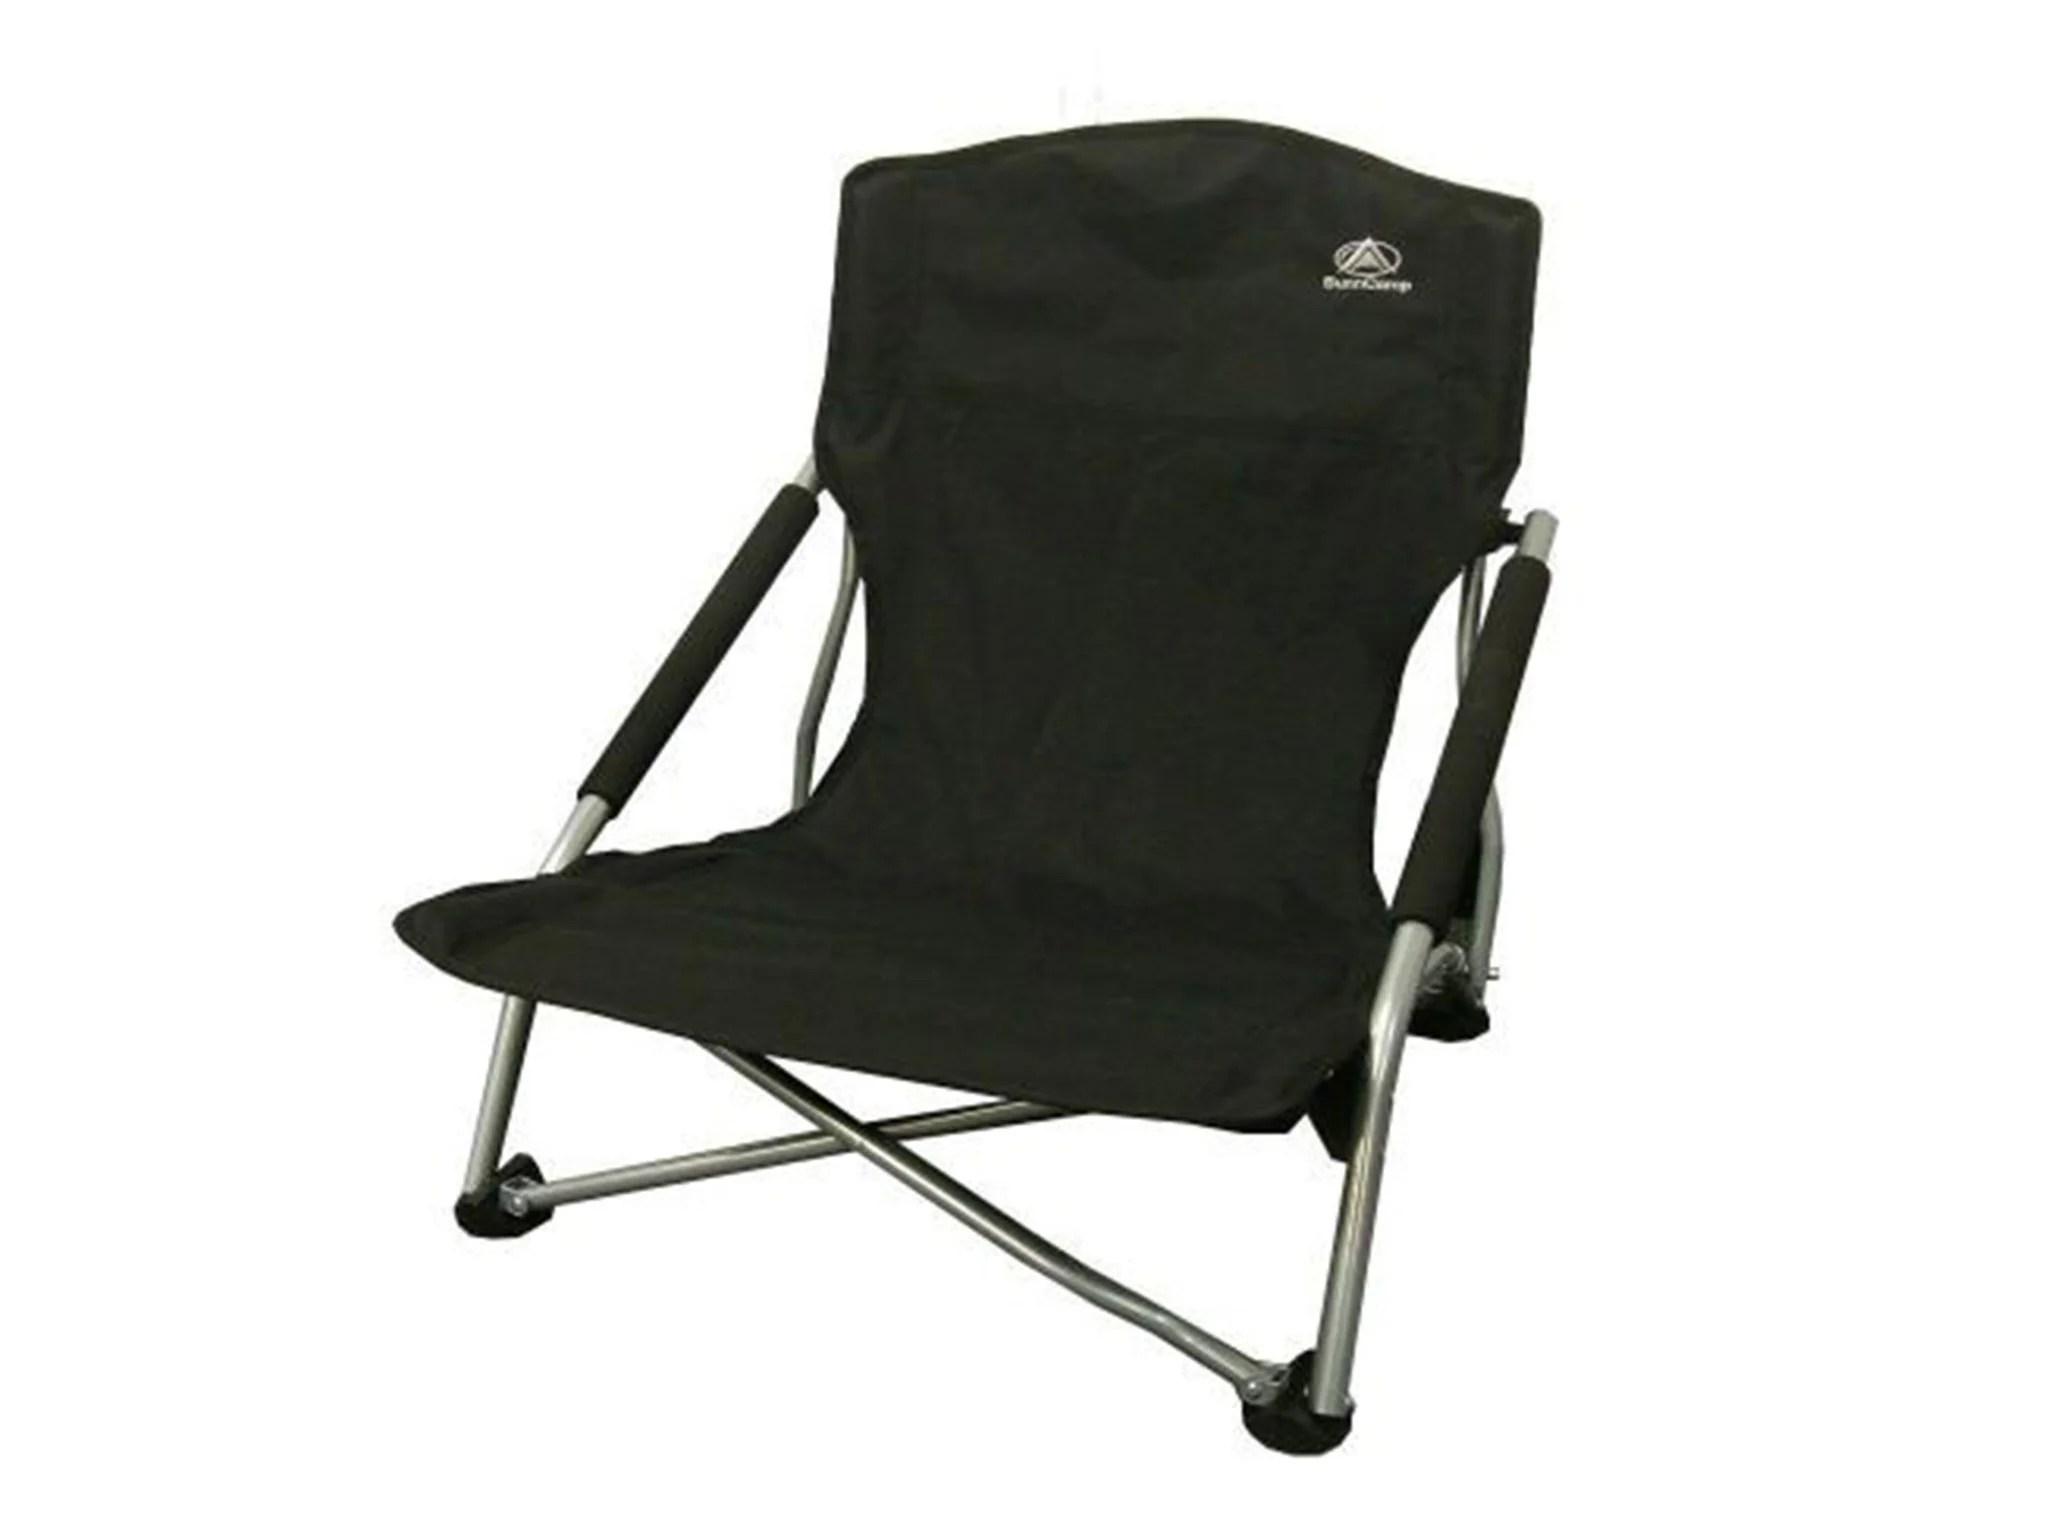 yeti folding chair oversized gravity snow peak review sante blog